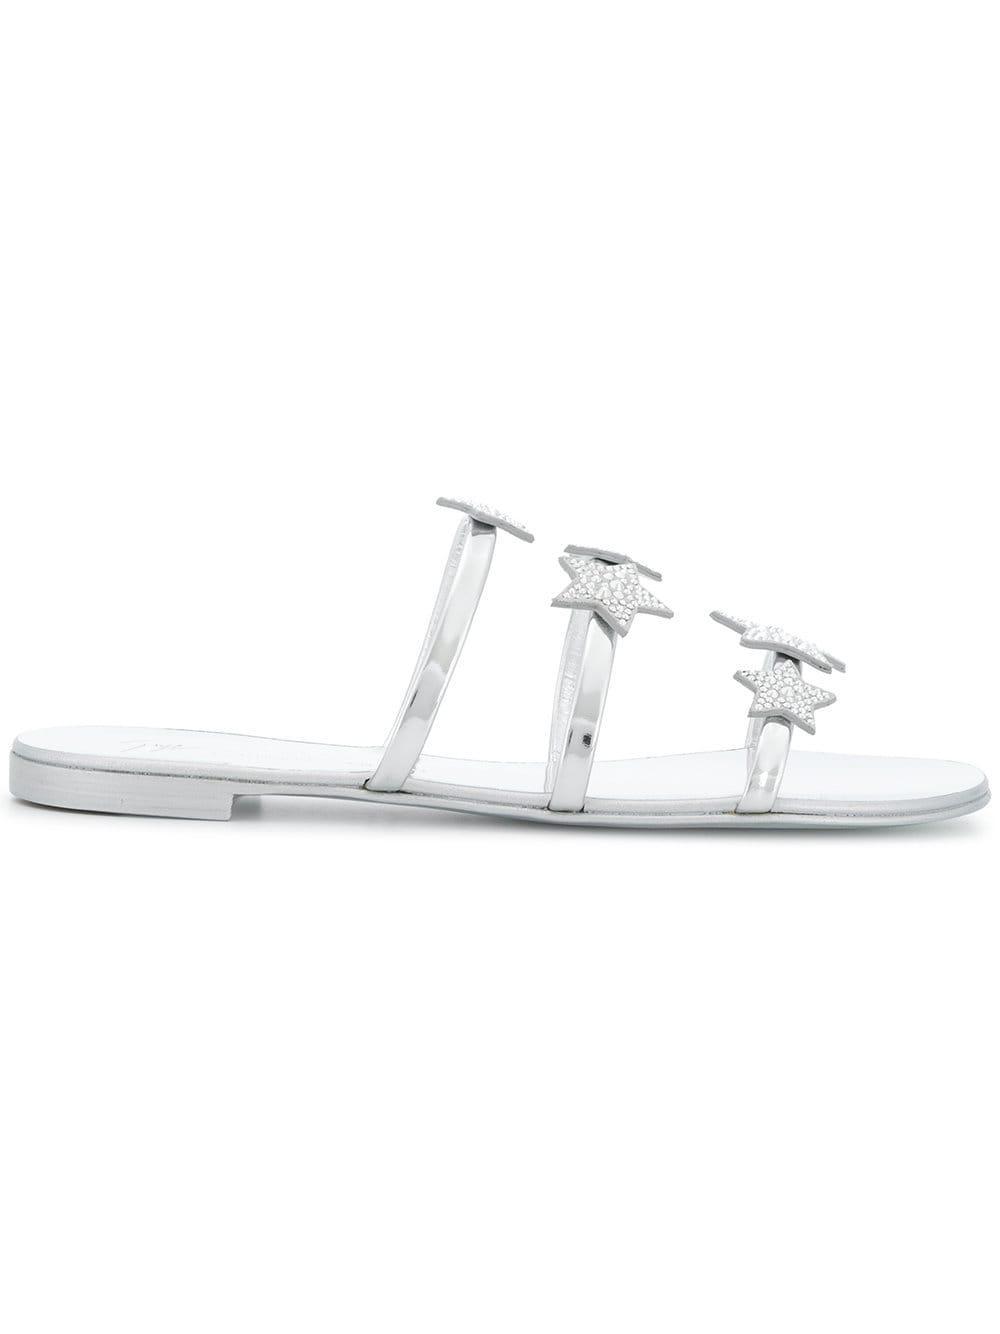 077ee7288208 Giuseppe Zanotti Star Strap Sandals in Metallic - Lyst